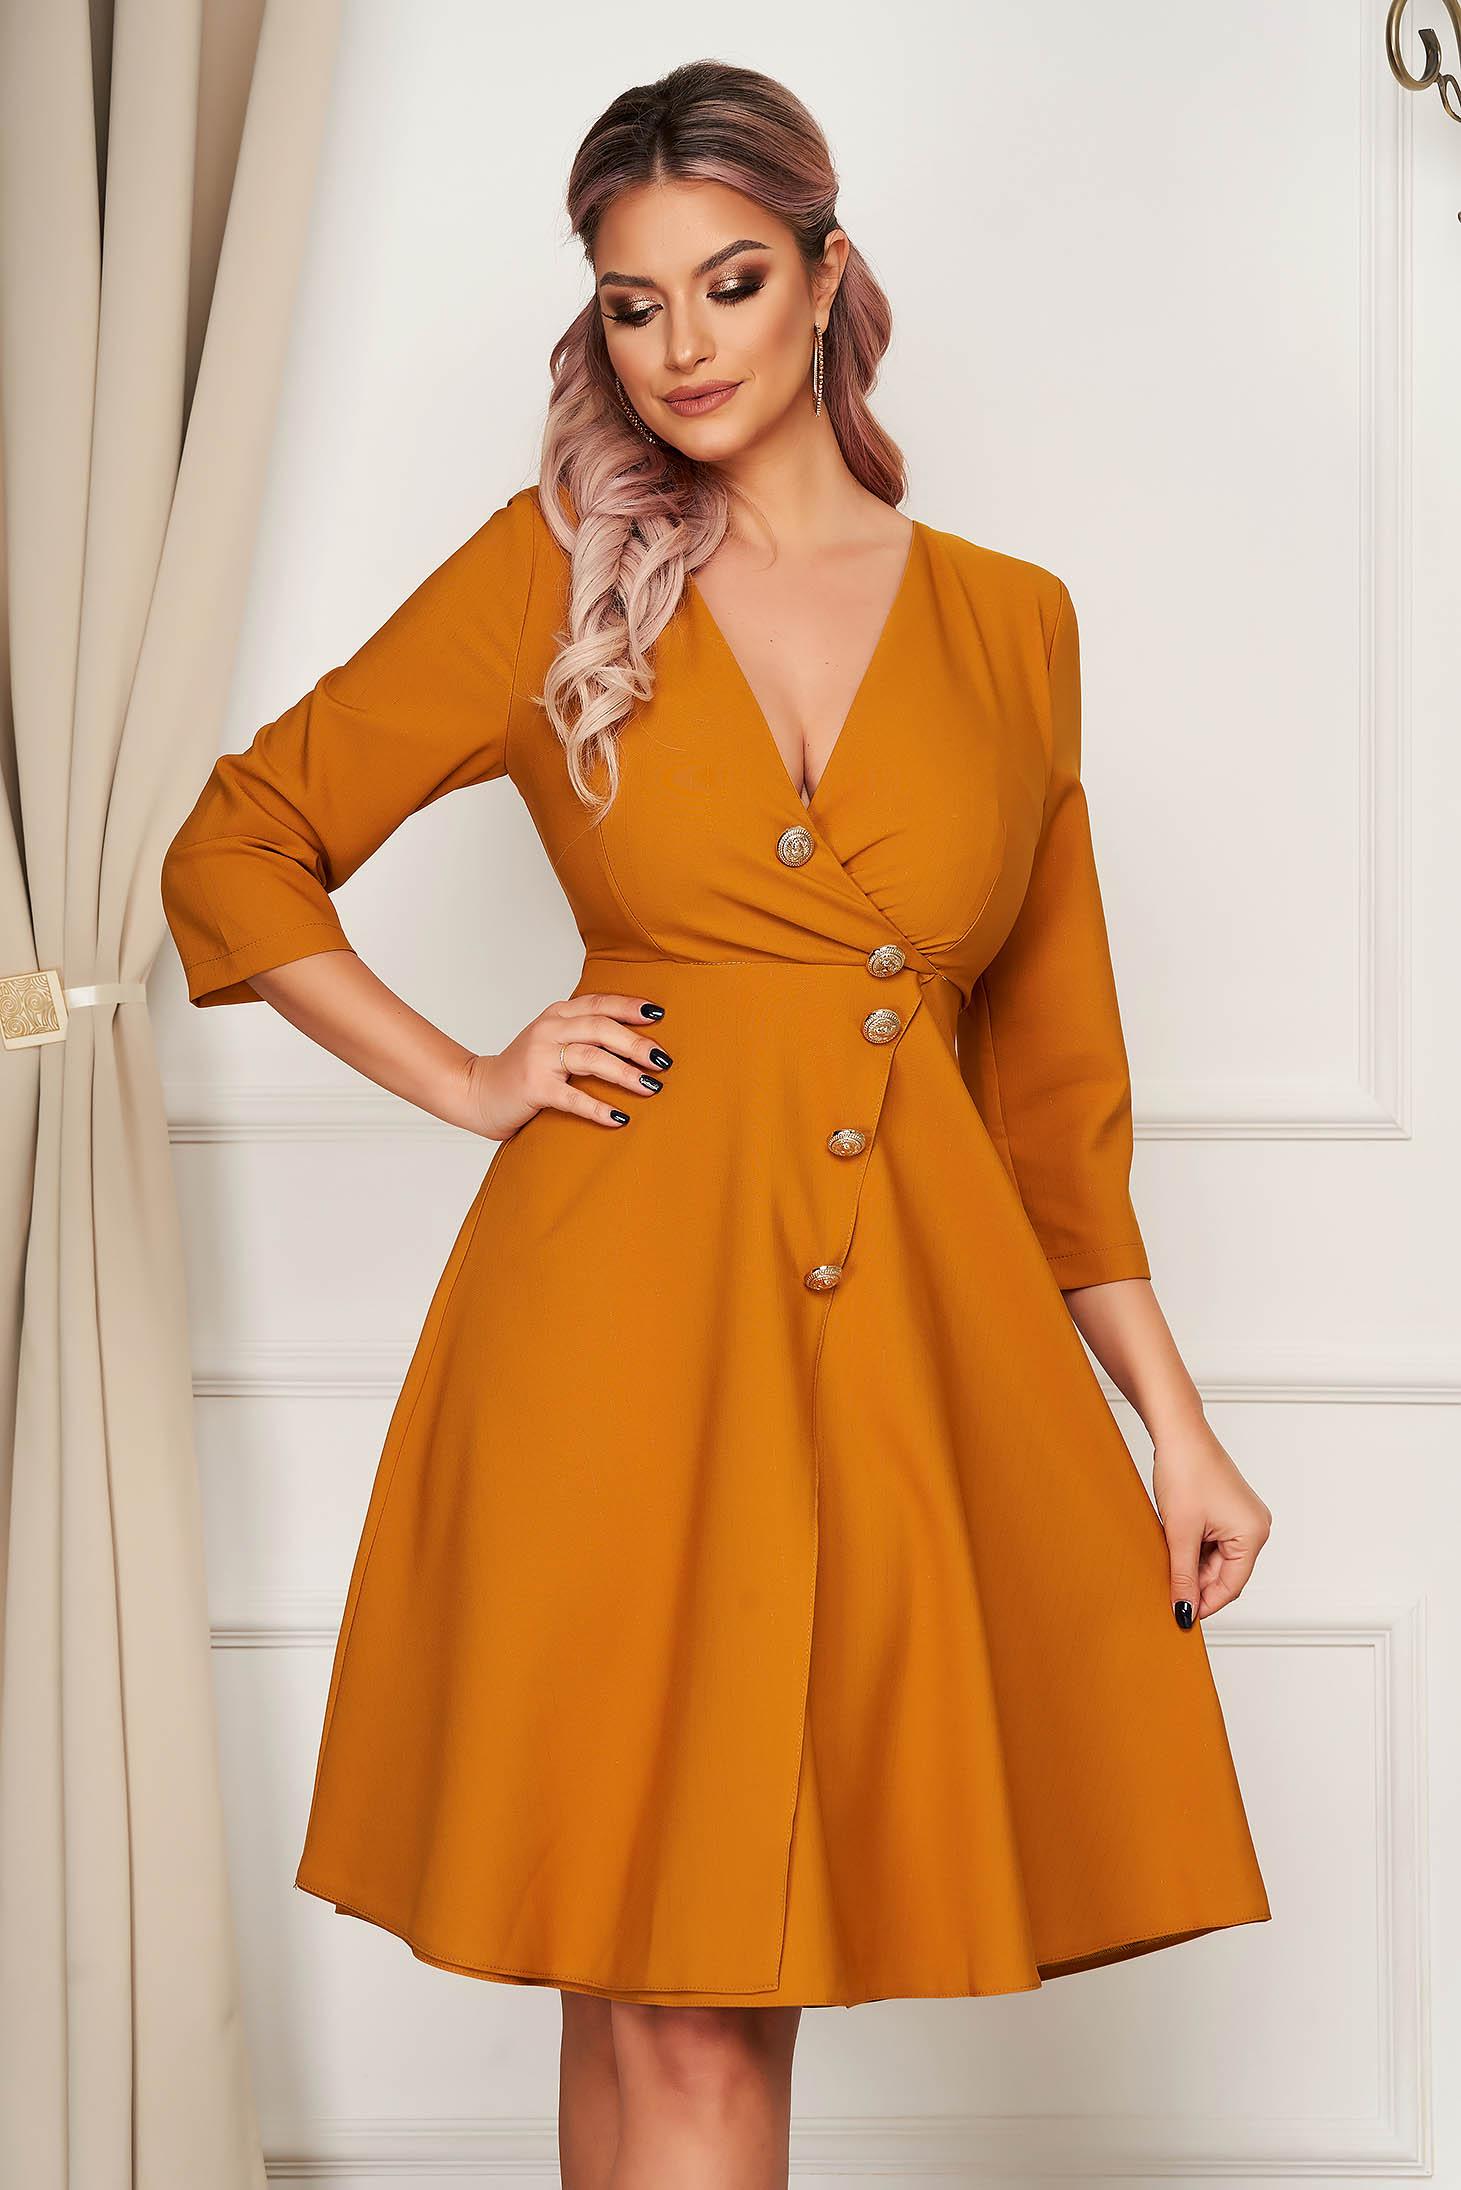 Rochie mustarie eleganta midi in clos din stofa usor elastica accesorizata cu nasturi